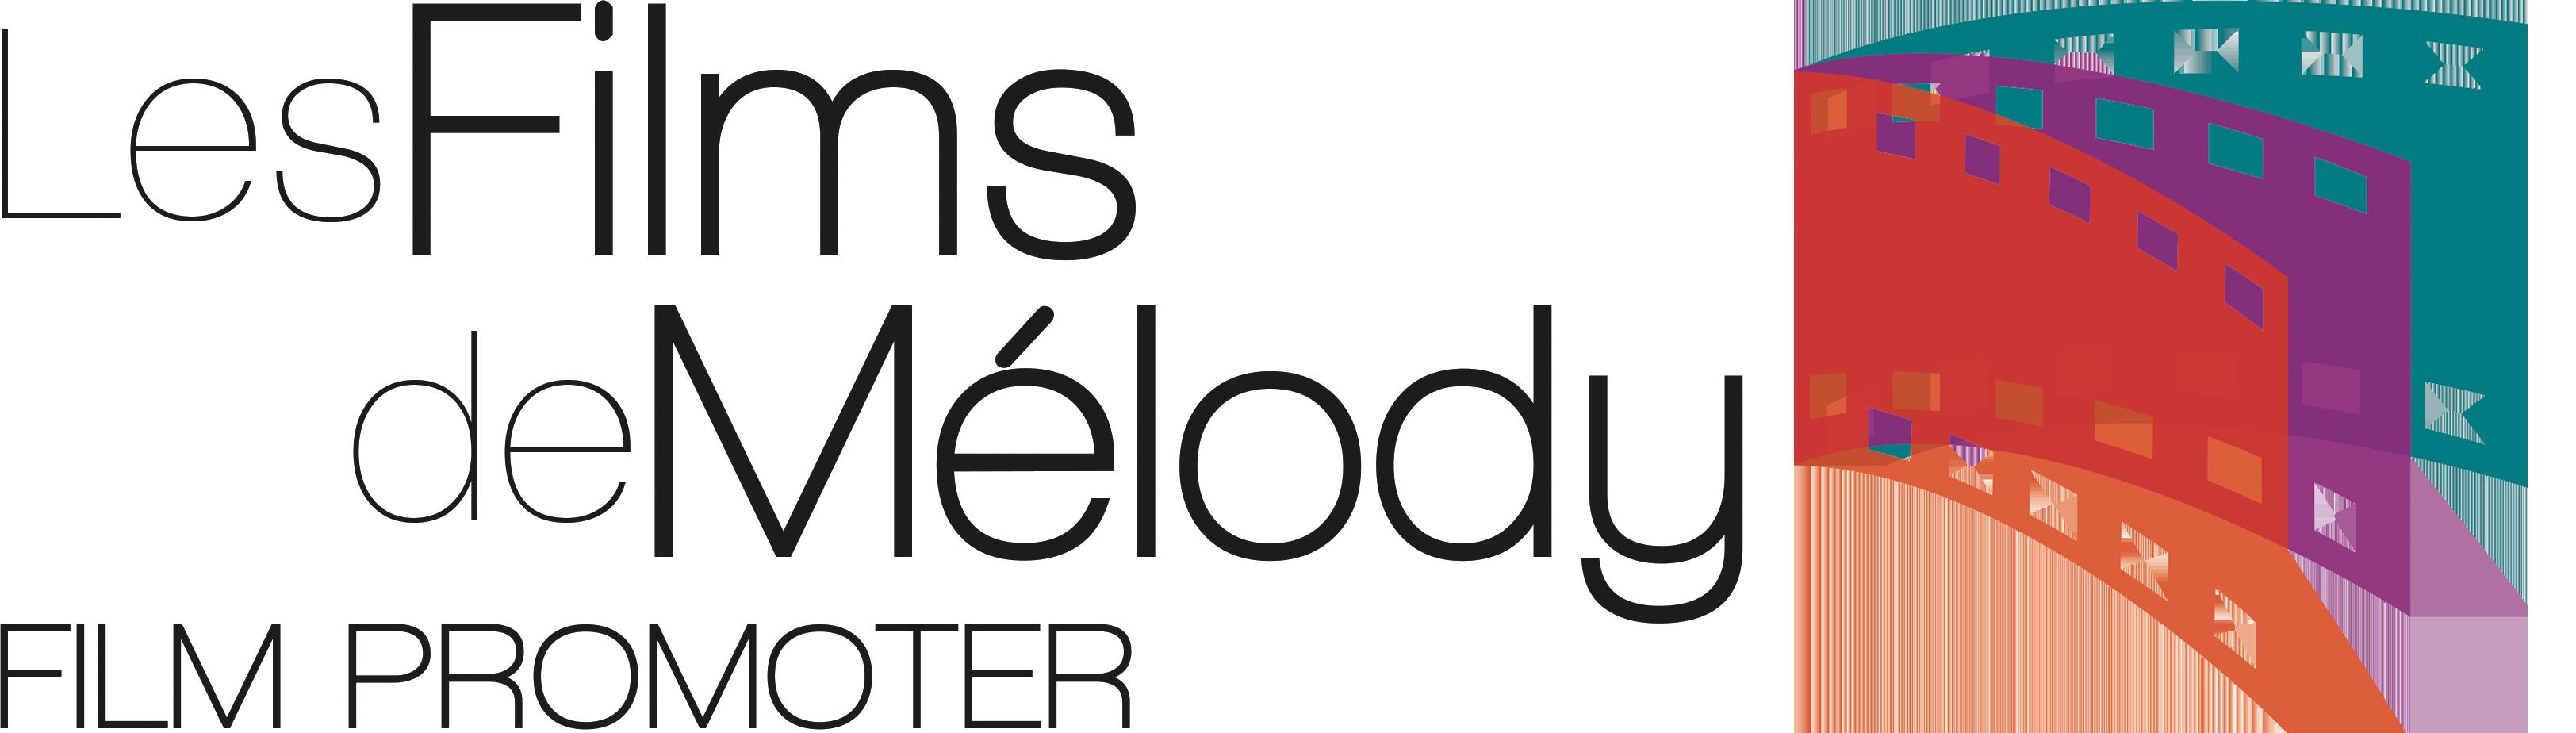 Les Films de Melody · FILM PROMOTER